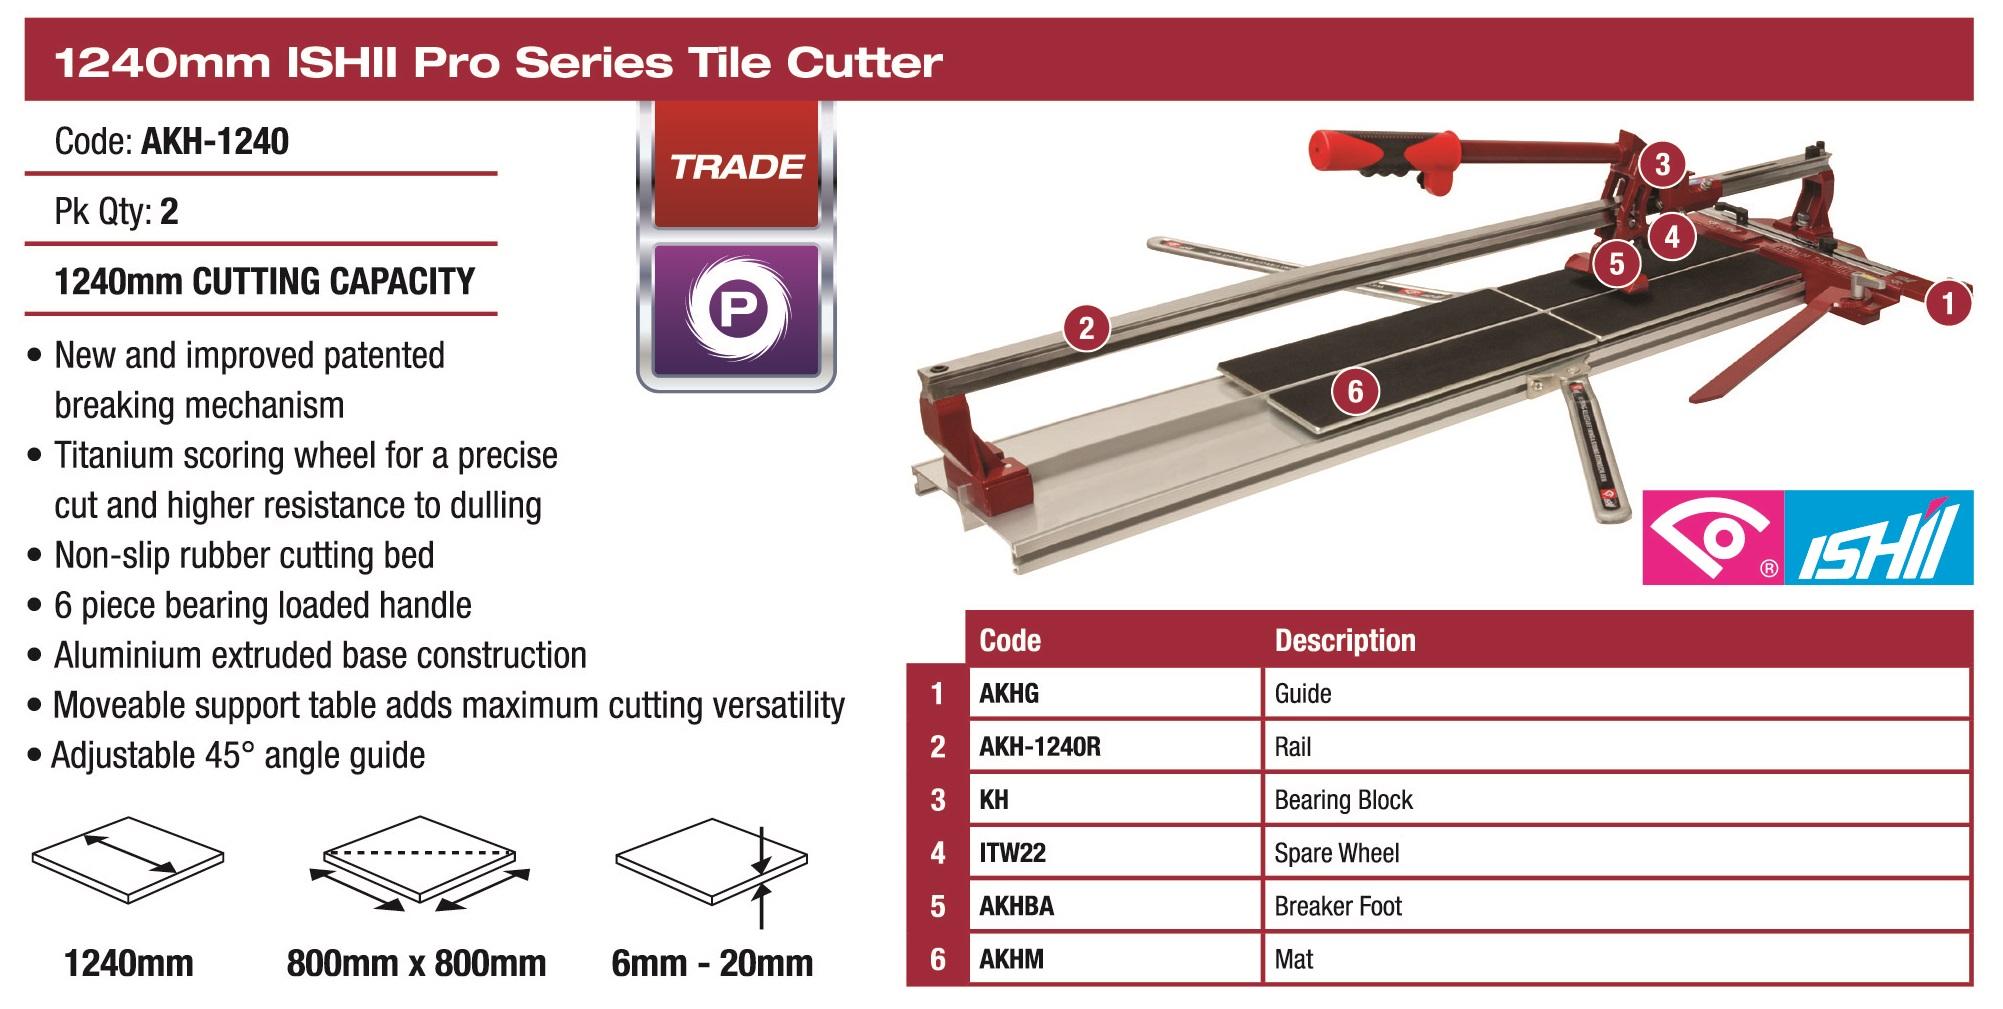 Ishii Pro Tile Cutter 1240mm 2